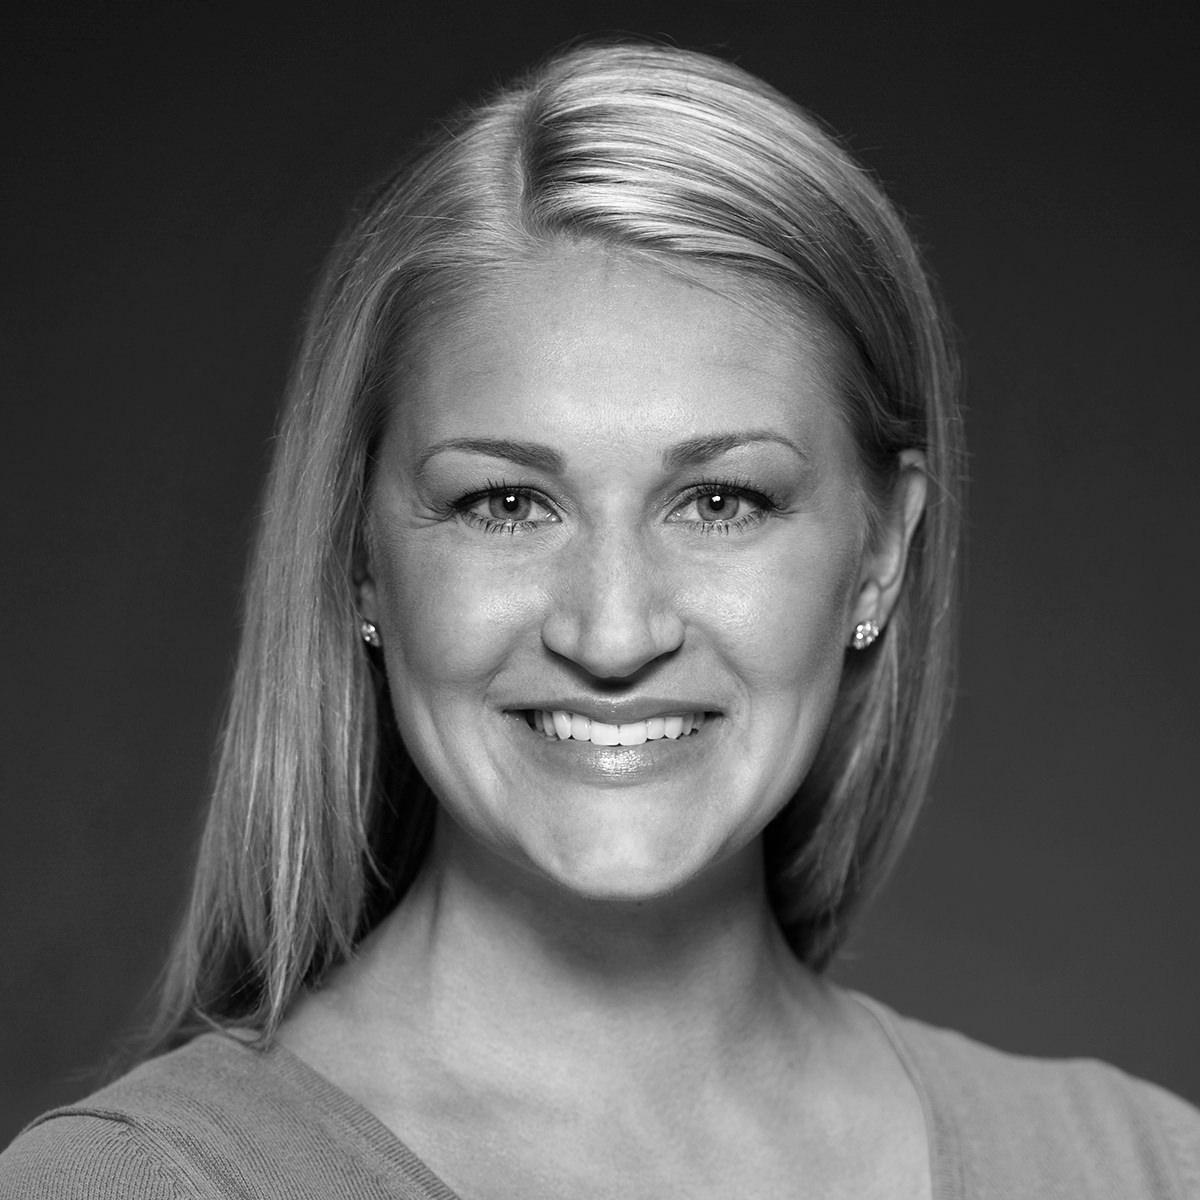 Stephanie Walton |Cycling Substitute, Yen Yoga & Fitness in Traverse City, Michigan.